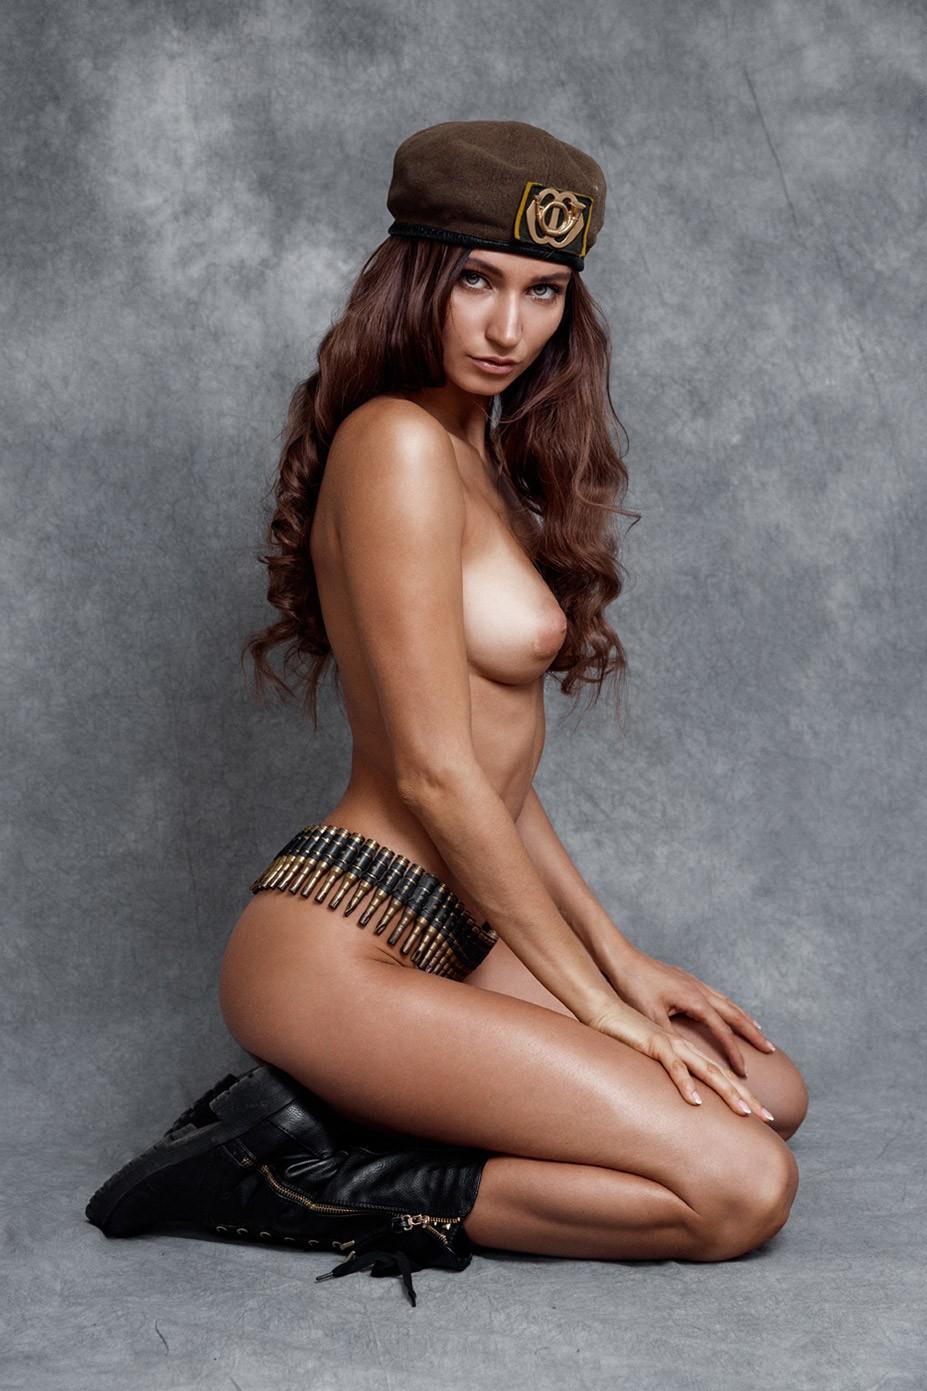 партизанка Илви Кокомо / Ilvy Kokomo nude by Tycho Herf – Lions Magazine